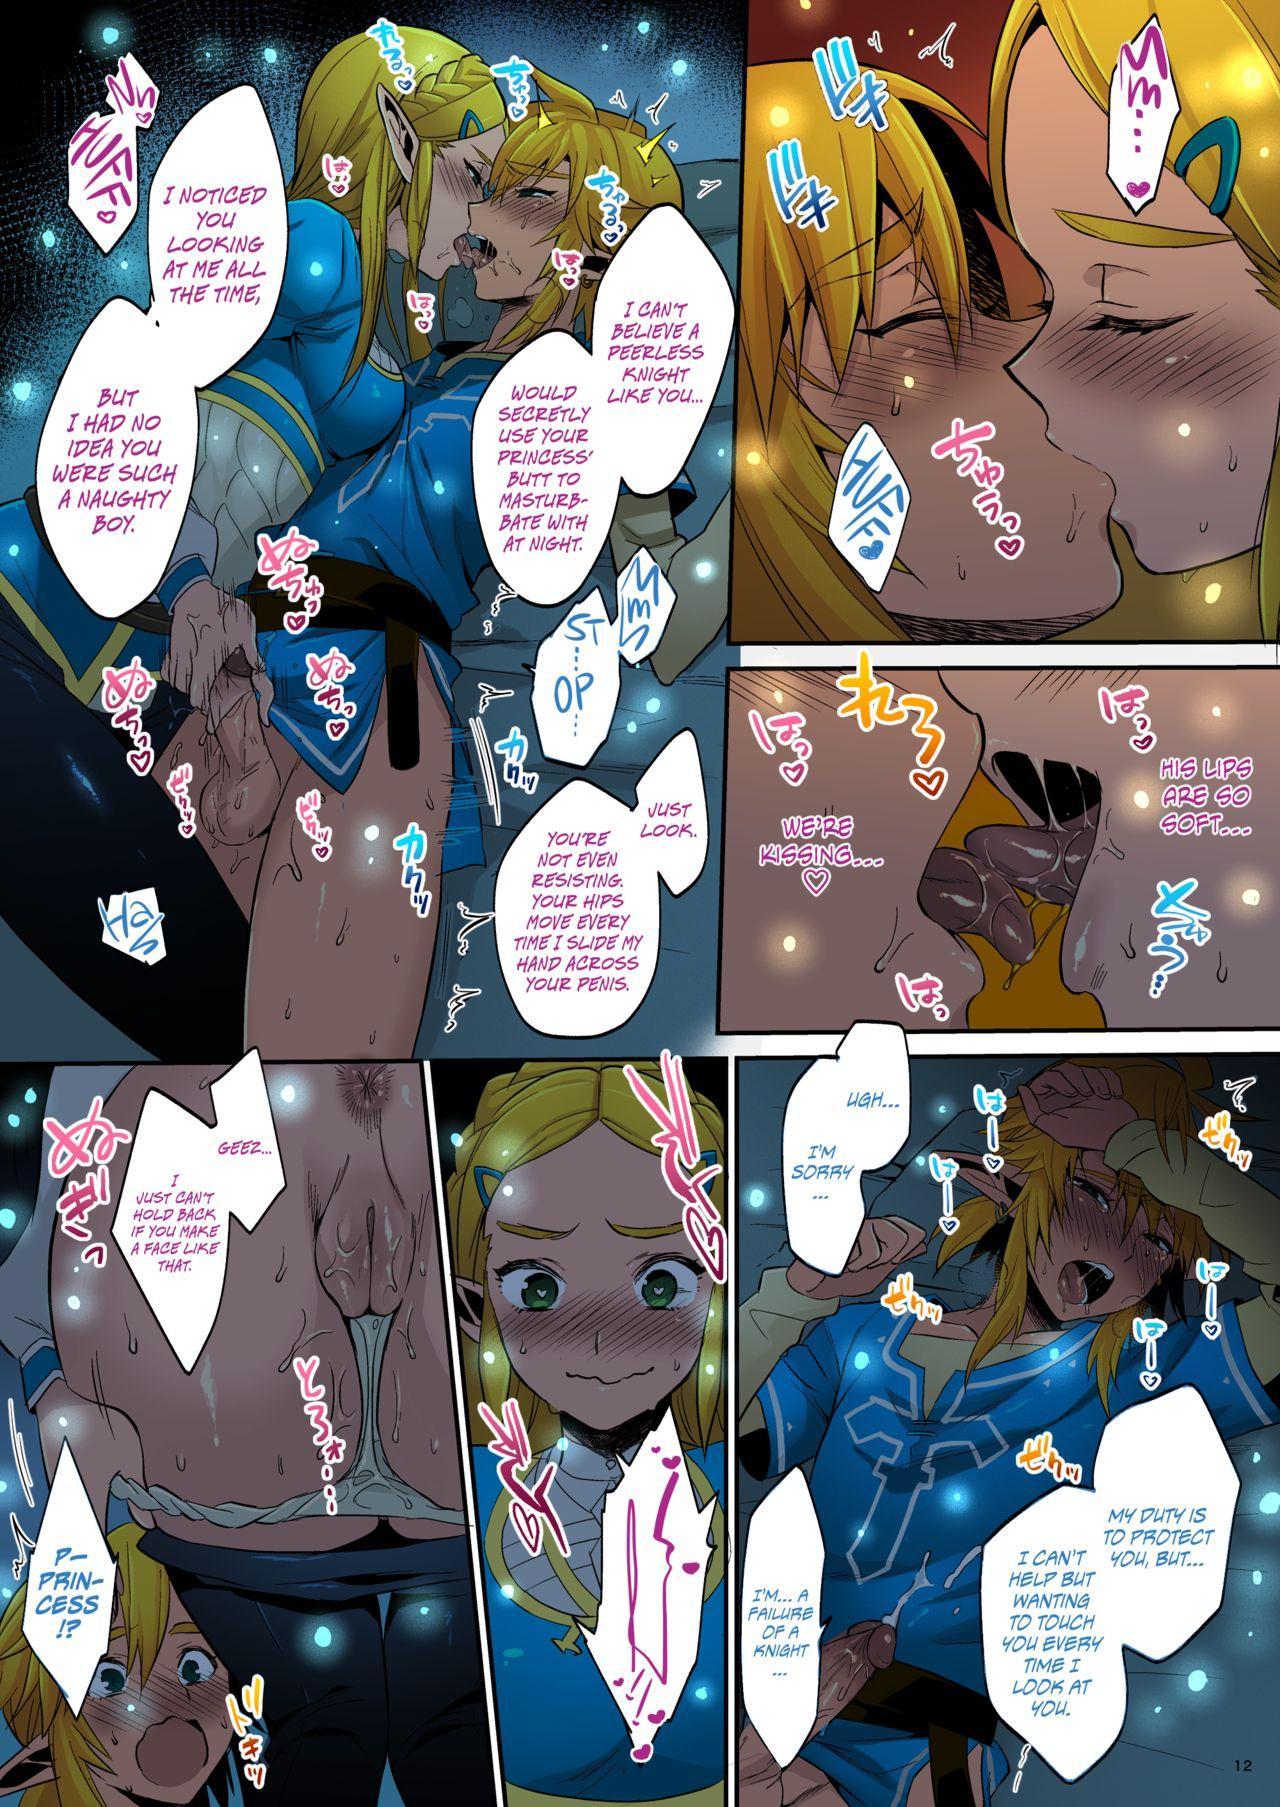 Hyrule Hanei no Tame no Katsudou!   Taking Steps to Ensure Hyrule's Prosperity! 12